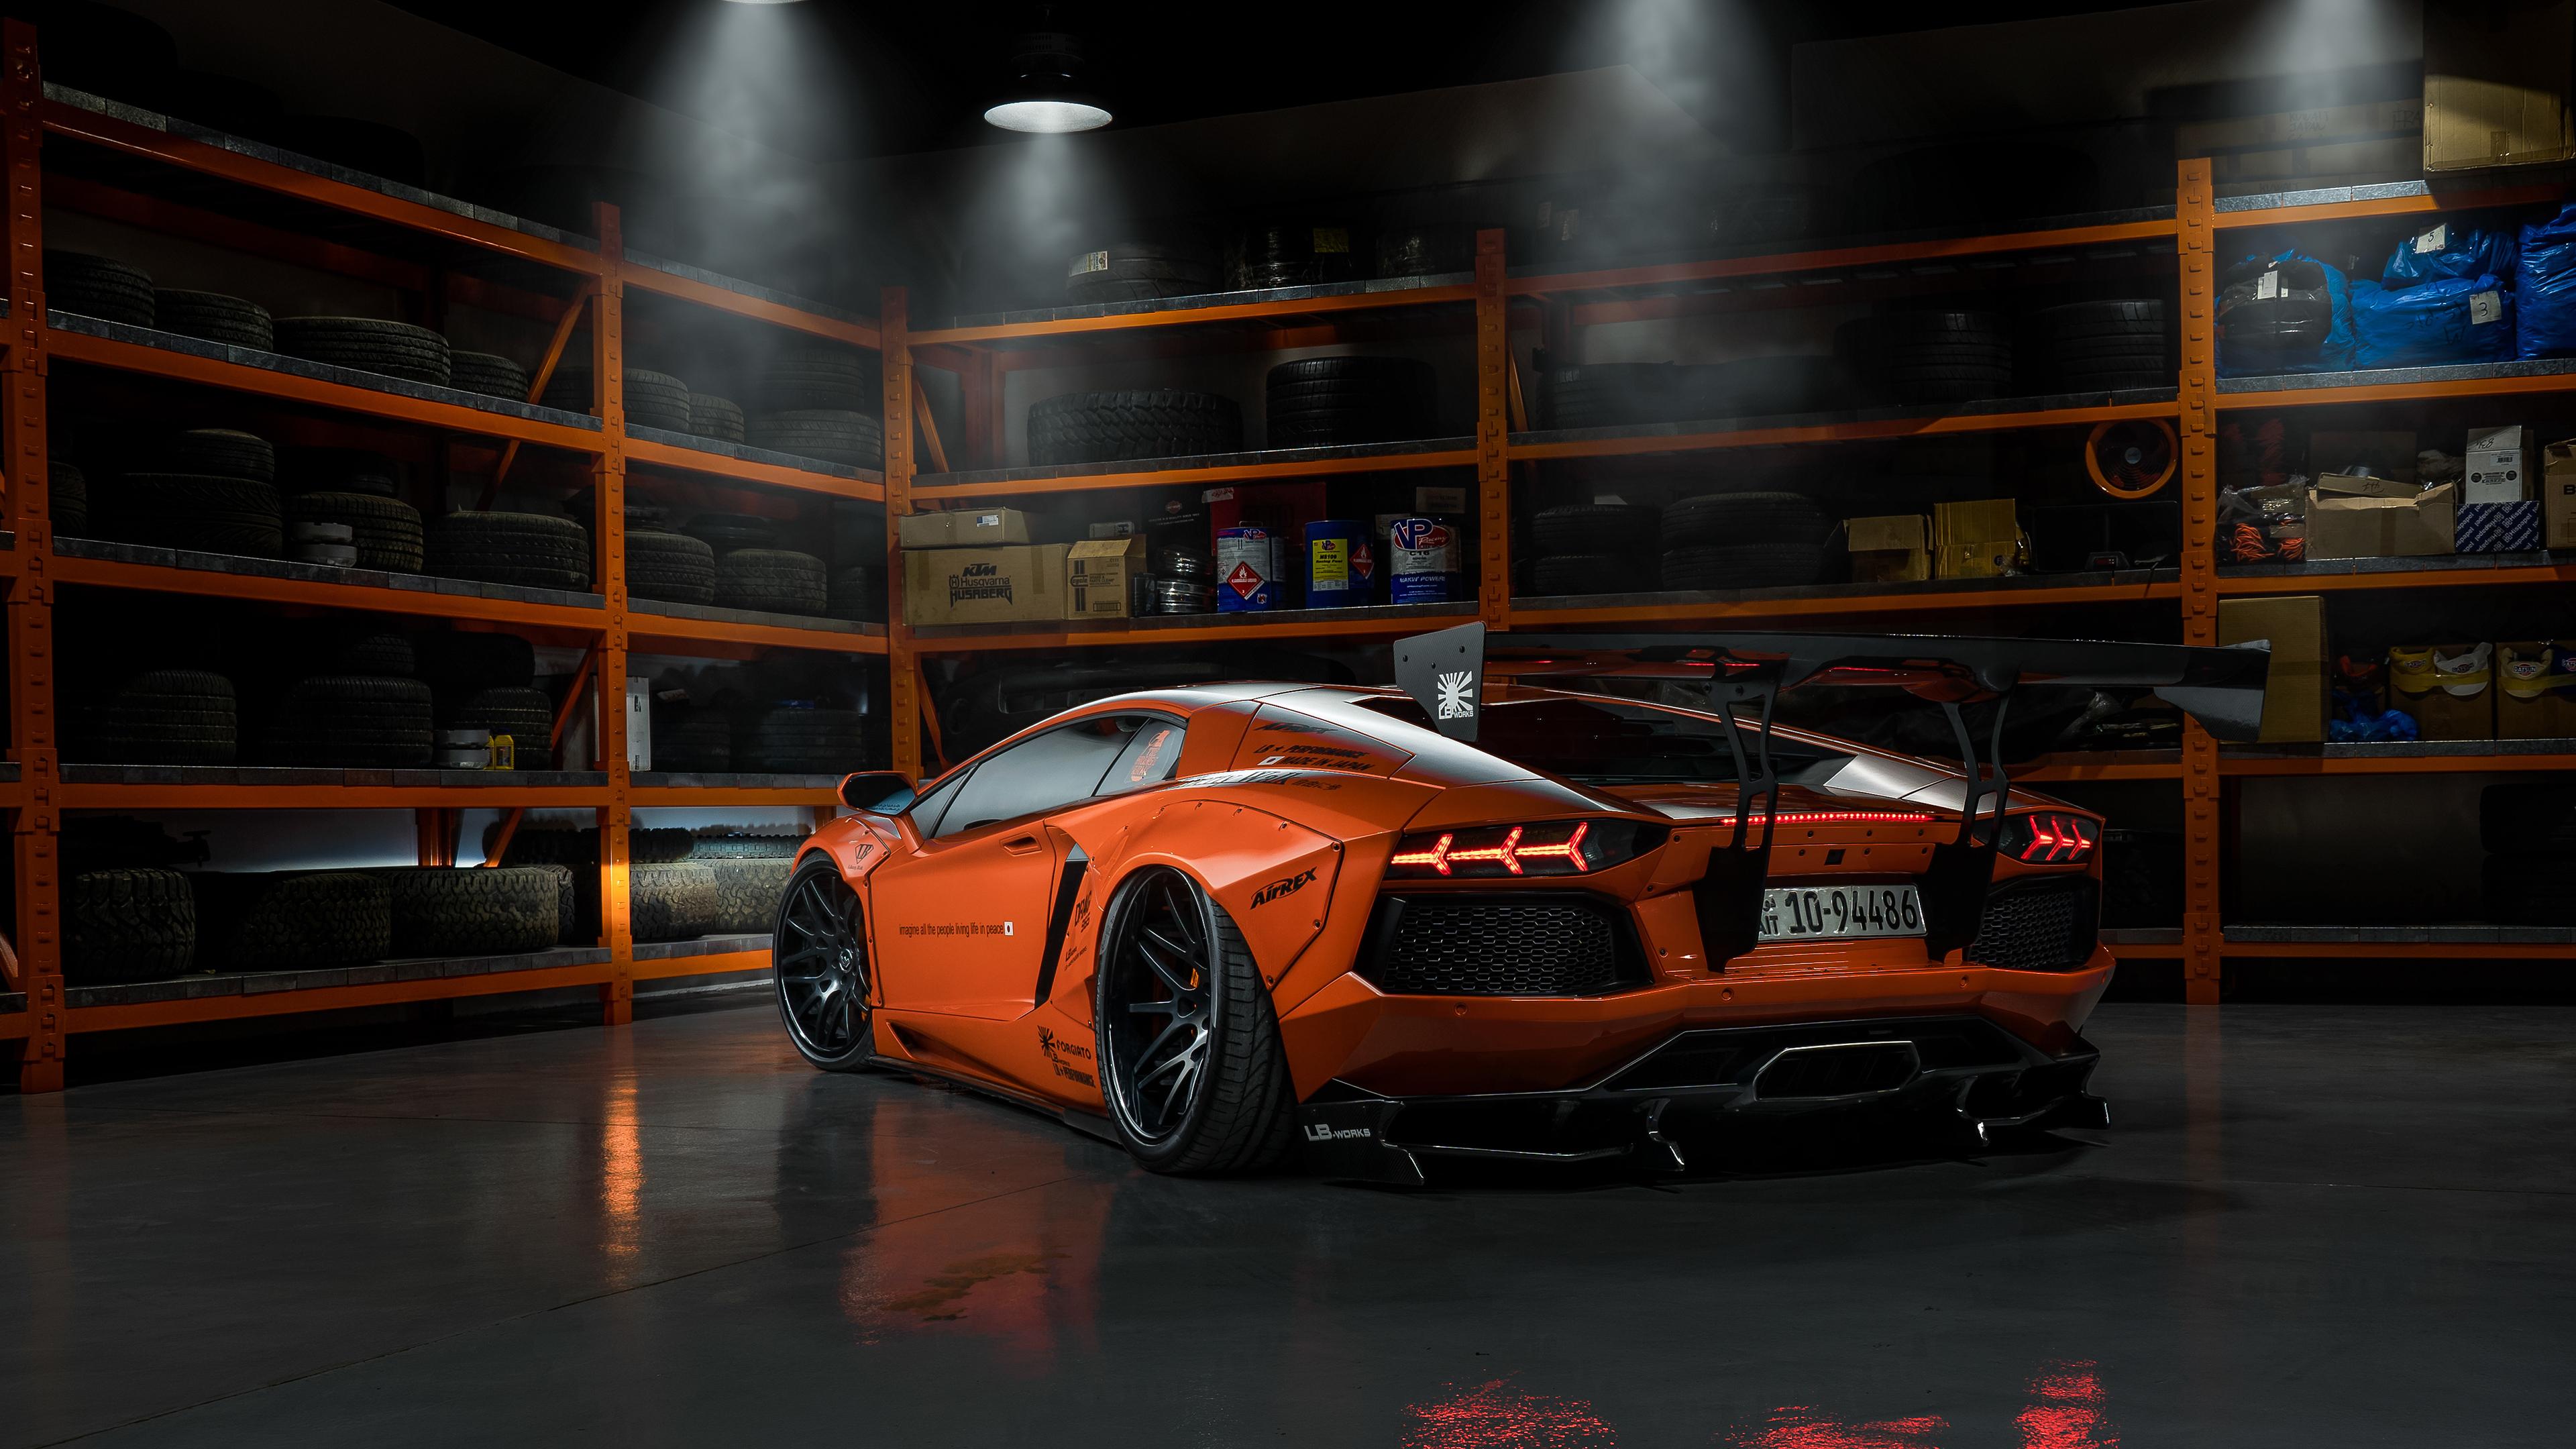 orange lamborghini 2019 1569188477 - Orange Lamborghini 2019 - lamborghini wallpapers, lamborghini huracan wallpapers, hd-wallpapers, cars wallpapers, behance wallpapers, 4k-wallpapers